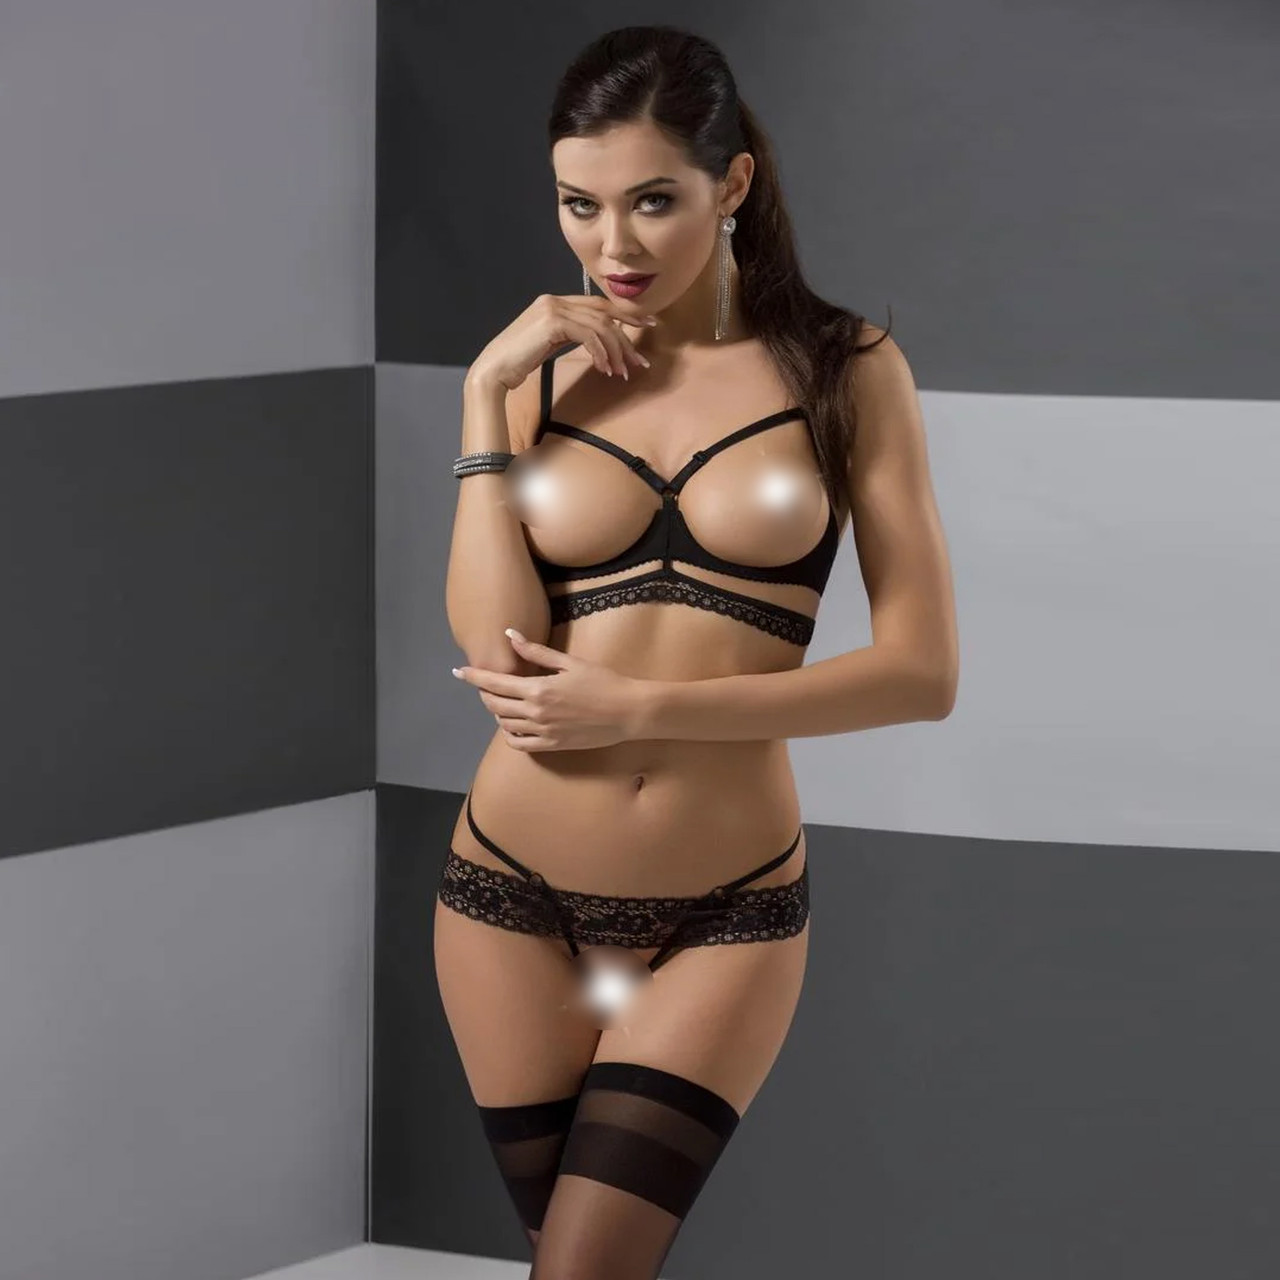 Комплект білизни SARIA SET OpenBra black L/XL - Passion Exclusive: стрэпы: откртый ліф, стрінги